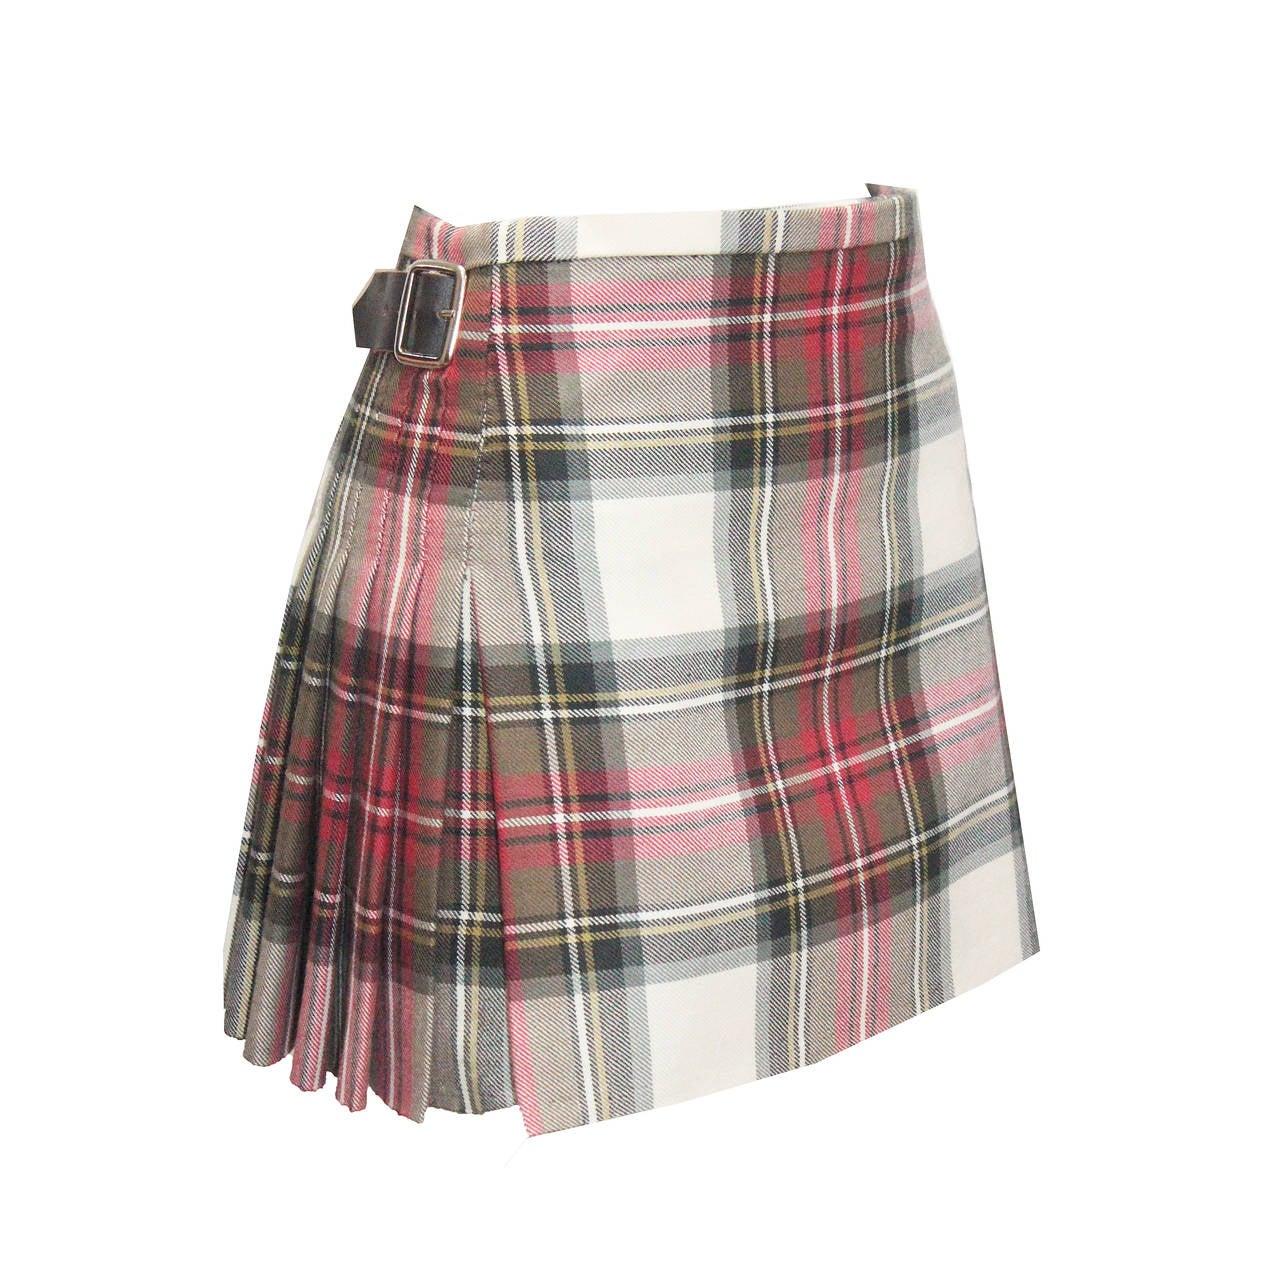 The Iconic Vivienne Westwood Pleated Kilt Skirt C 1994 At